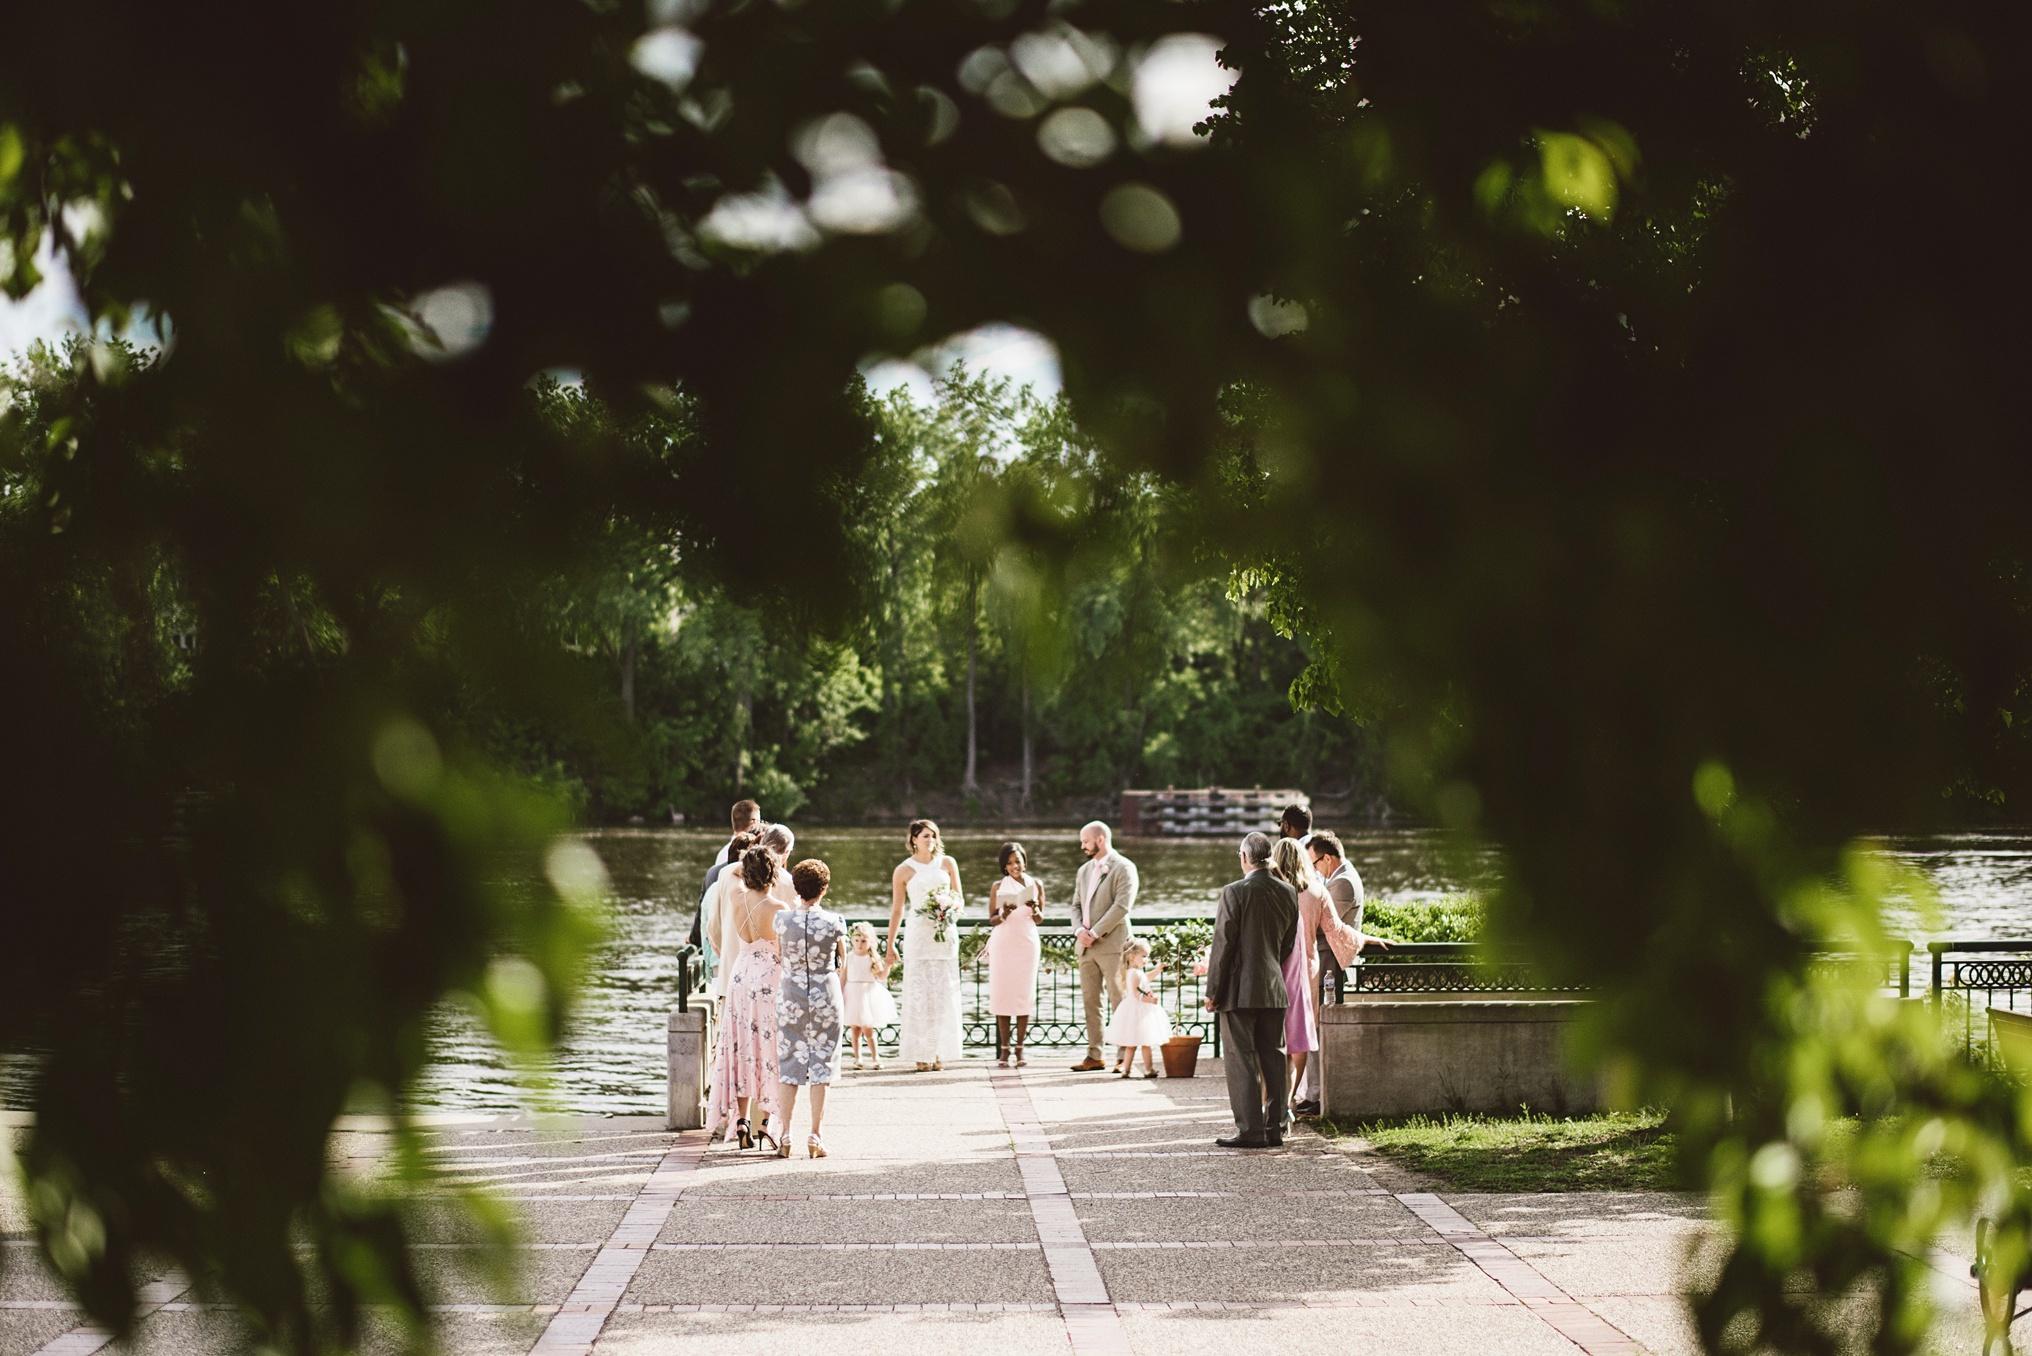 best_wedding_photography_2017_by_lucas_botz_photography_020.jpg